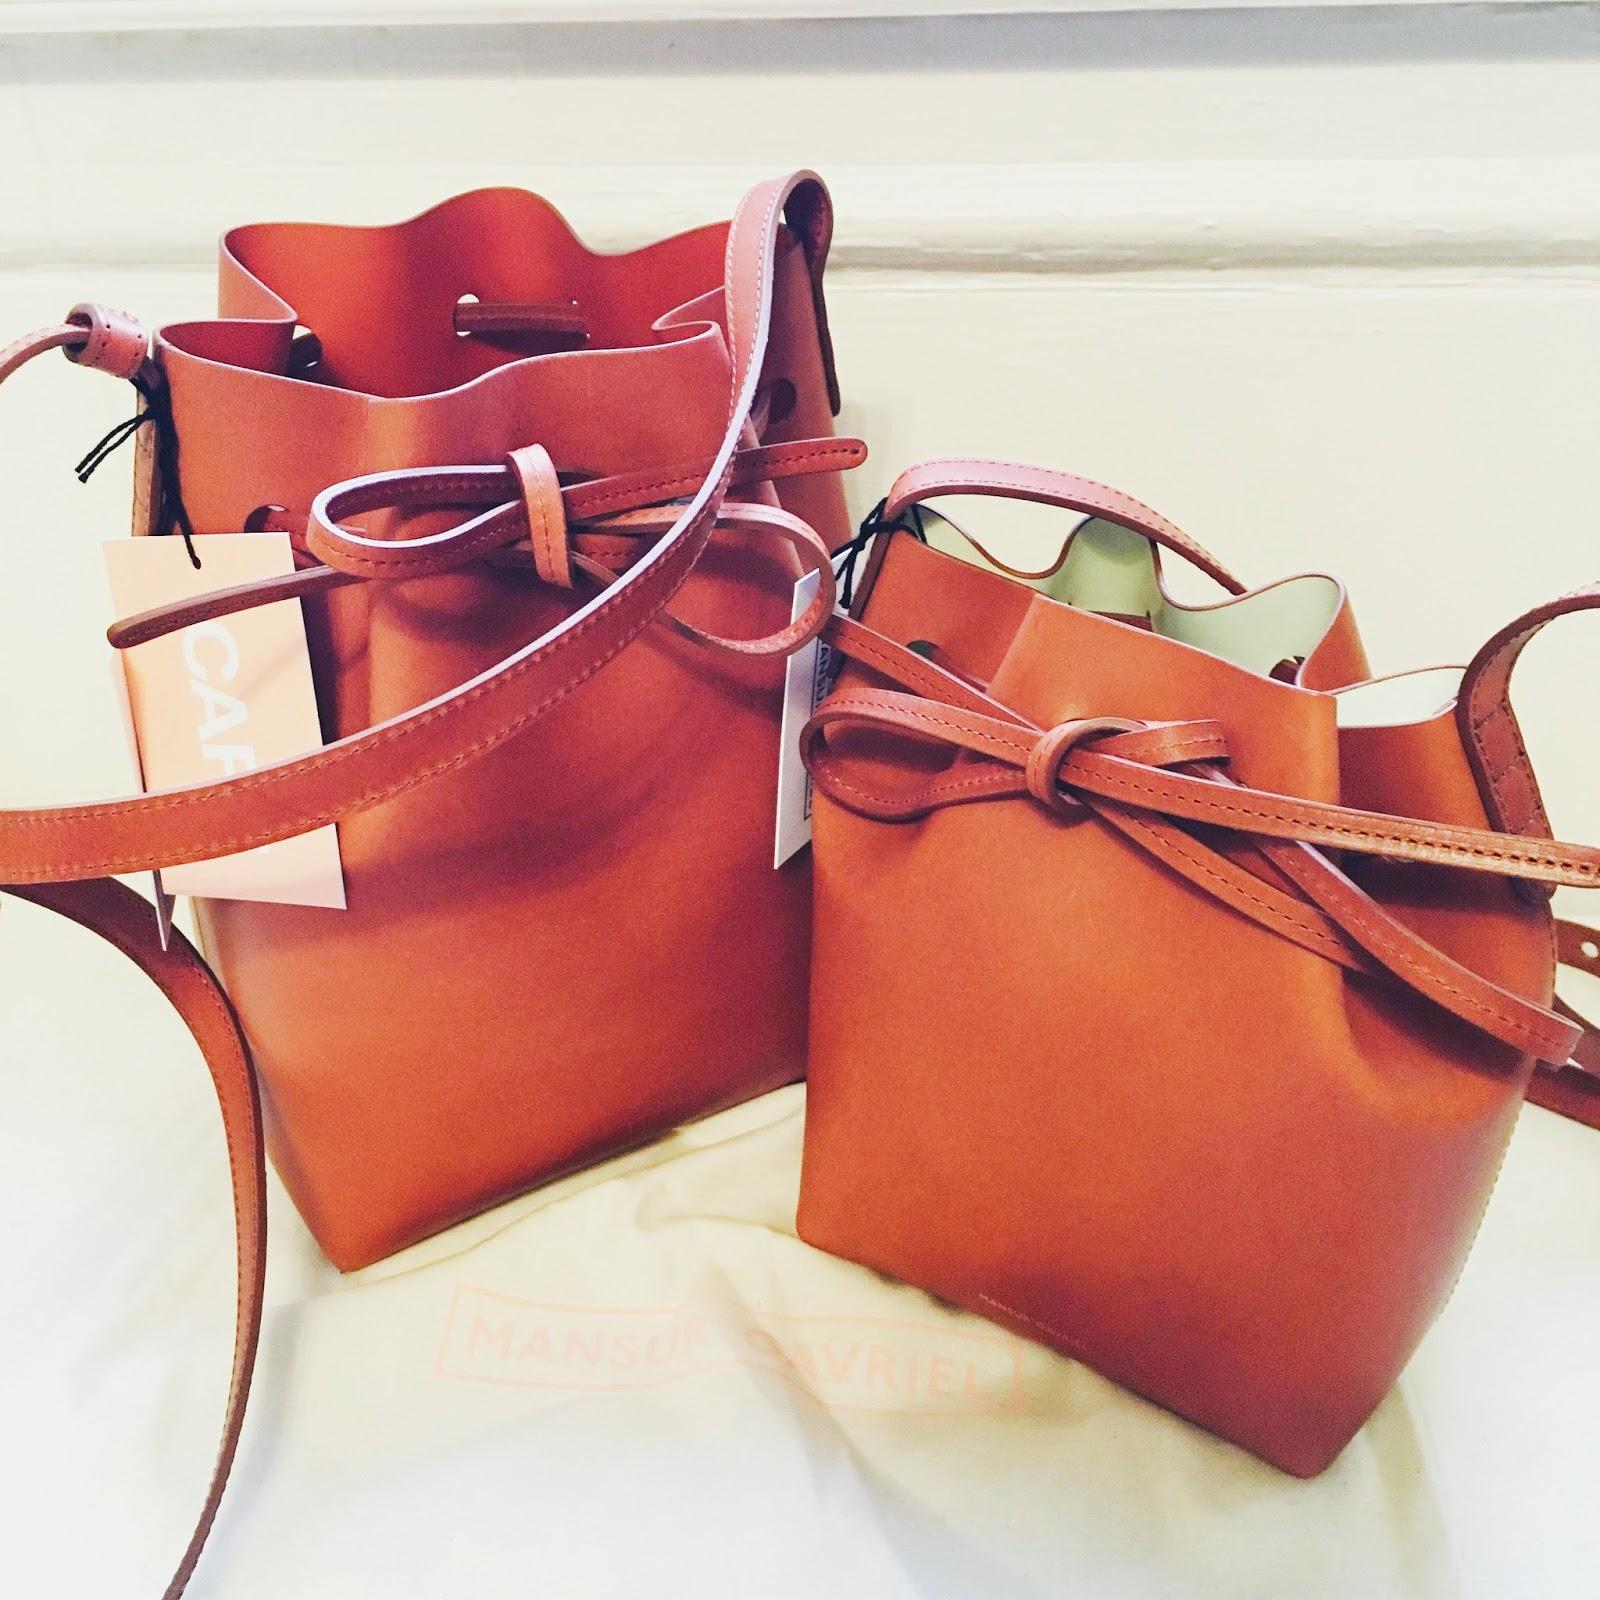 BNWT Authentic MANSUR GAVRIEL Mini (medium size) Bucket Bag in Brandy Brick  and Mini Mini (small size) Bucket Bag in Brandy Cleo. Both with tags